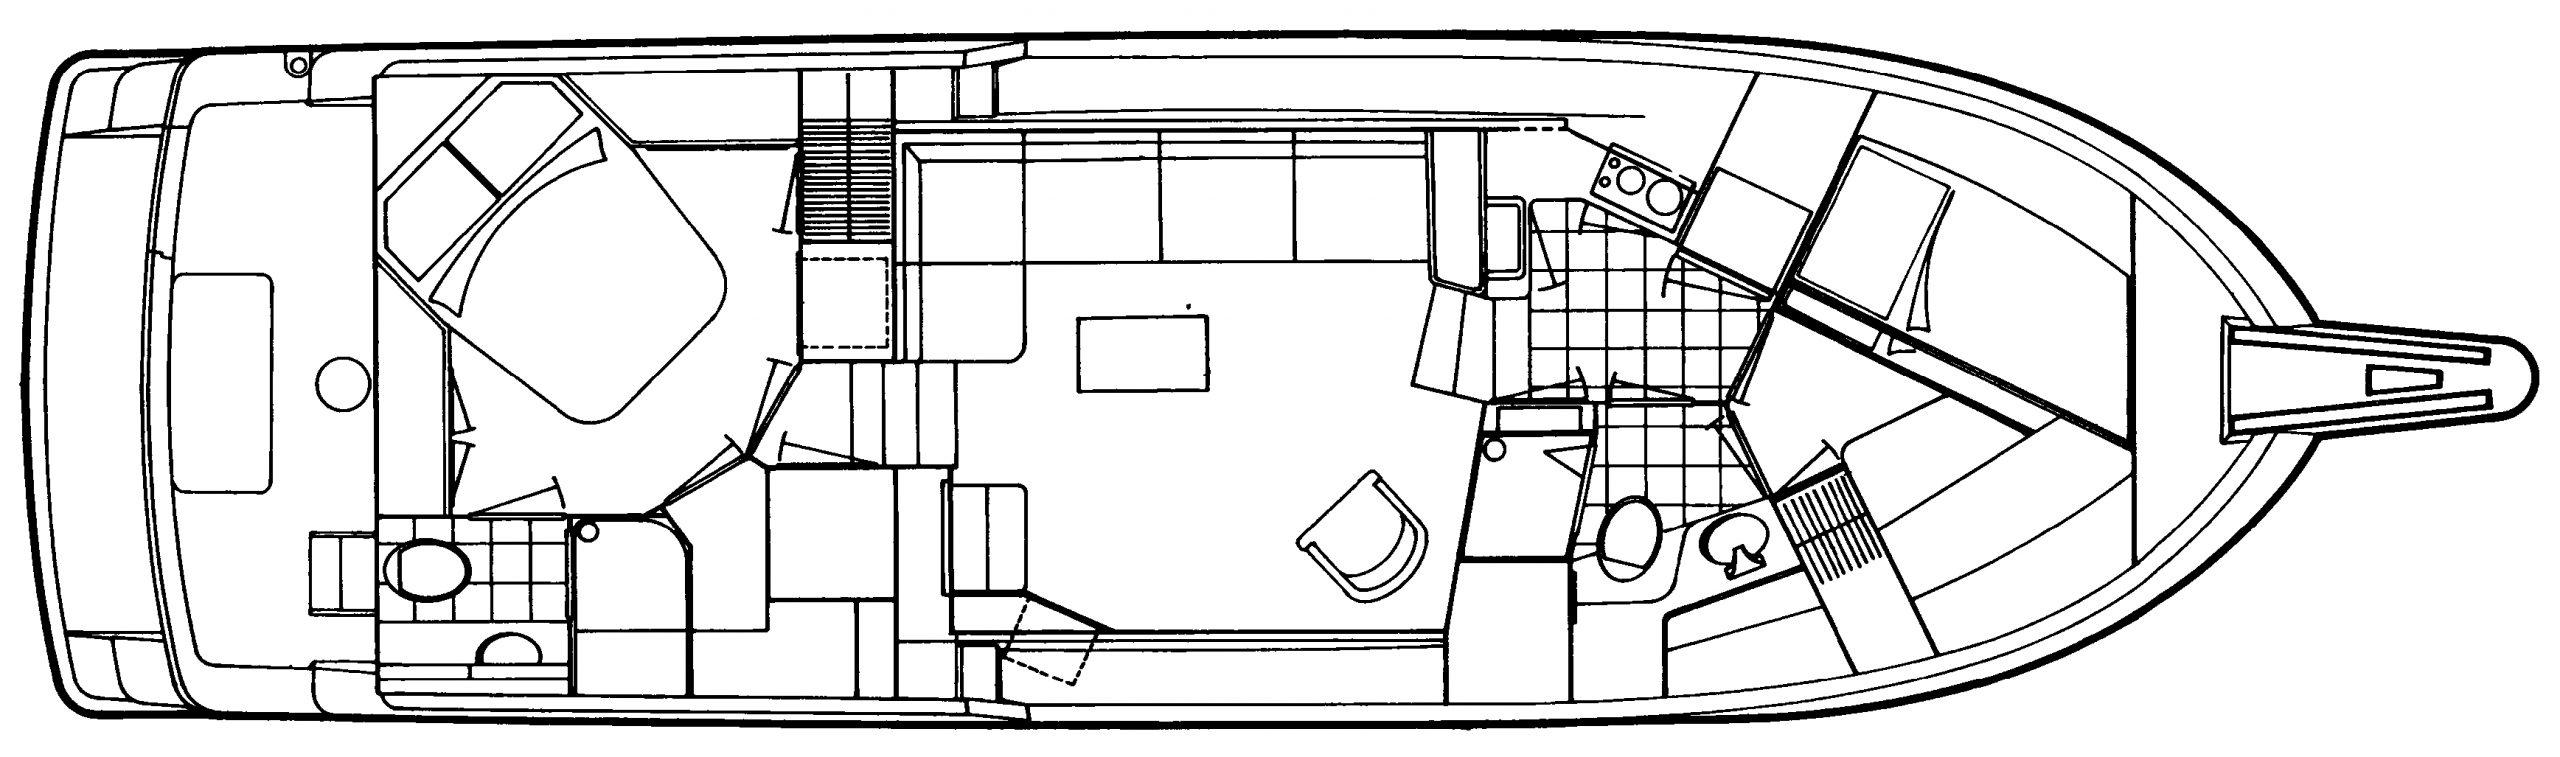 42 Cockpit Motor Yacht Floor Plan 2